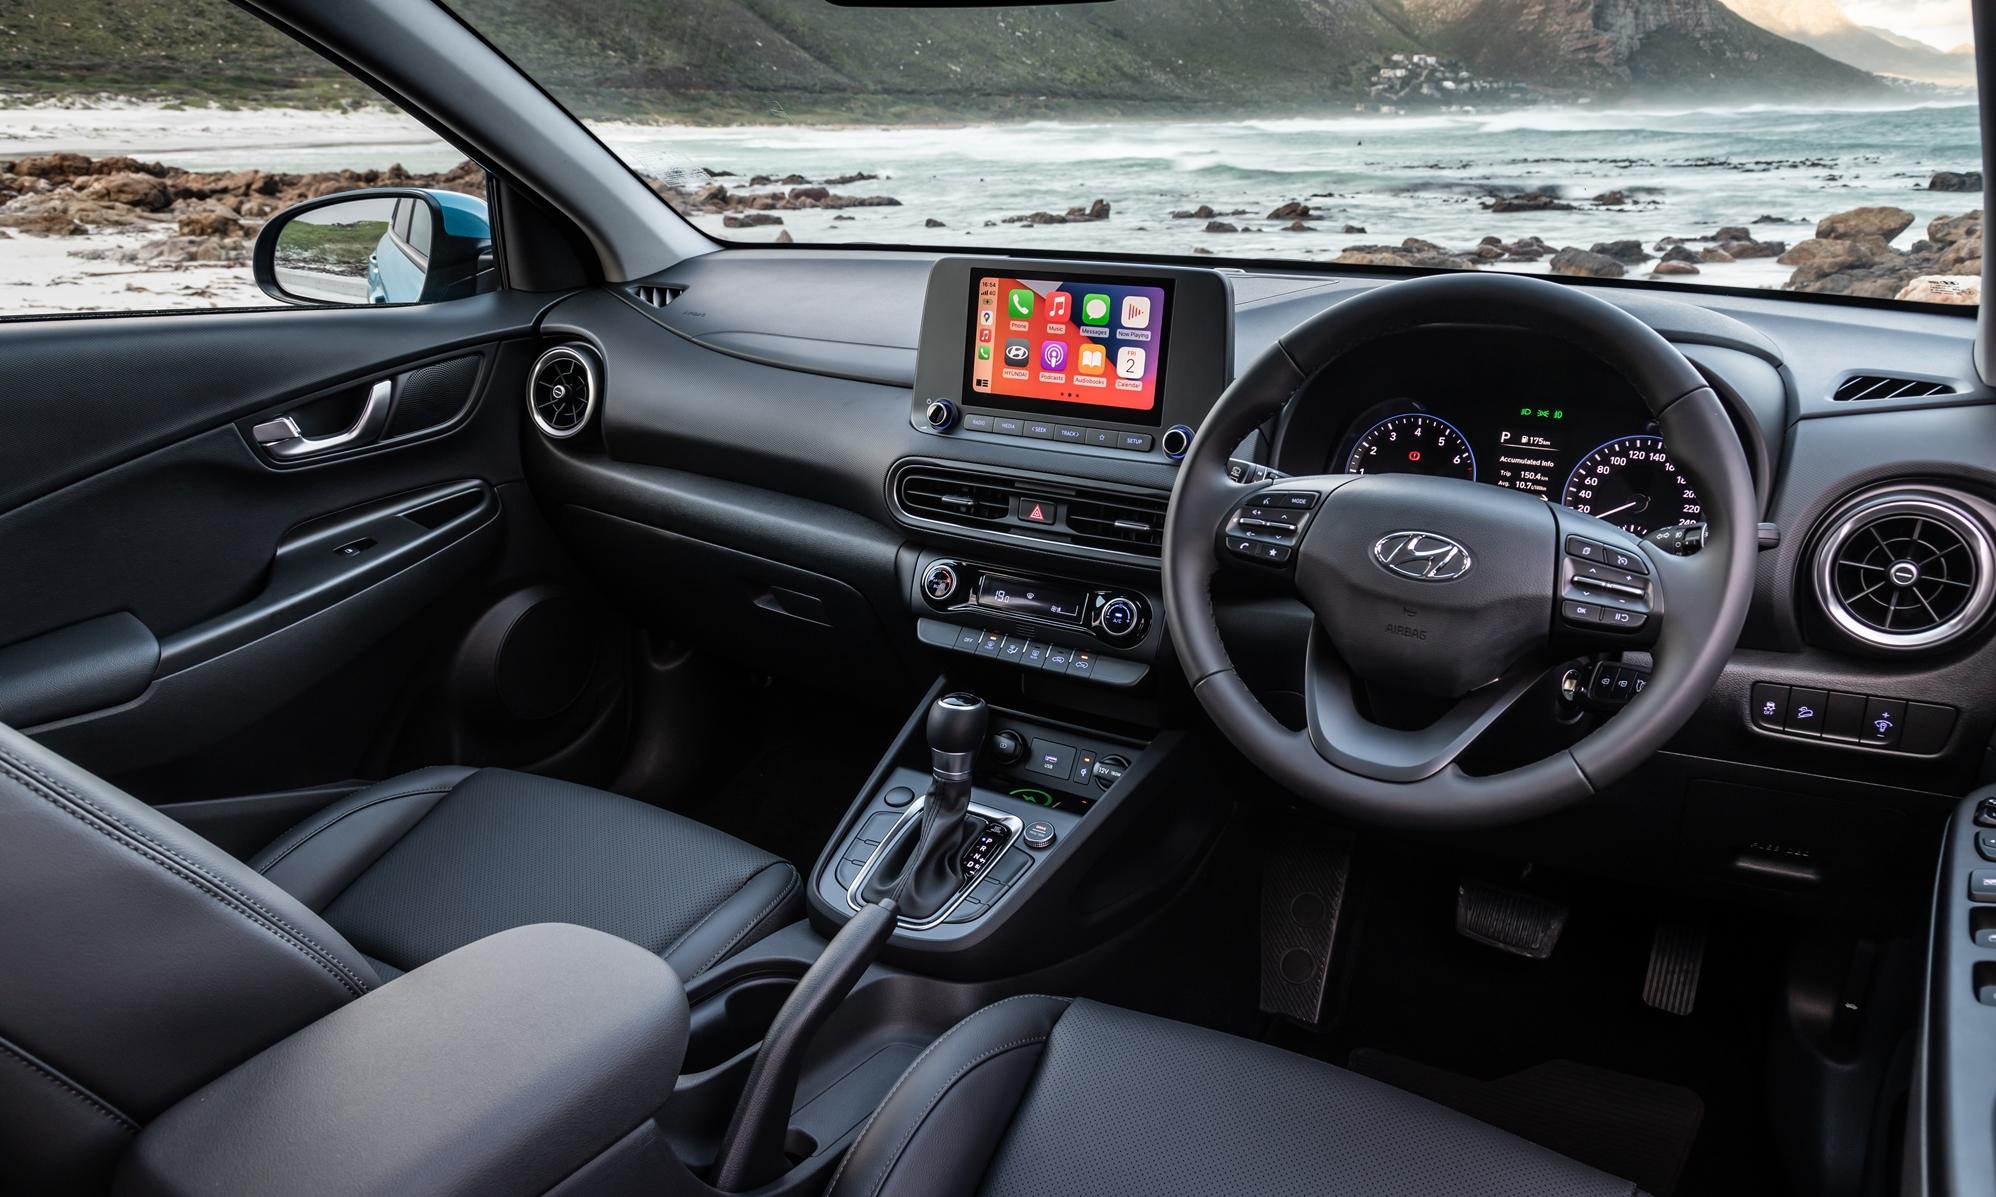 Facelifted Hyundai Kona interior